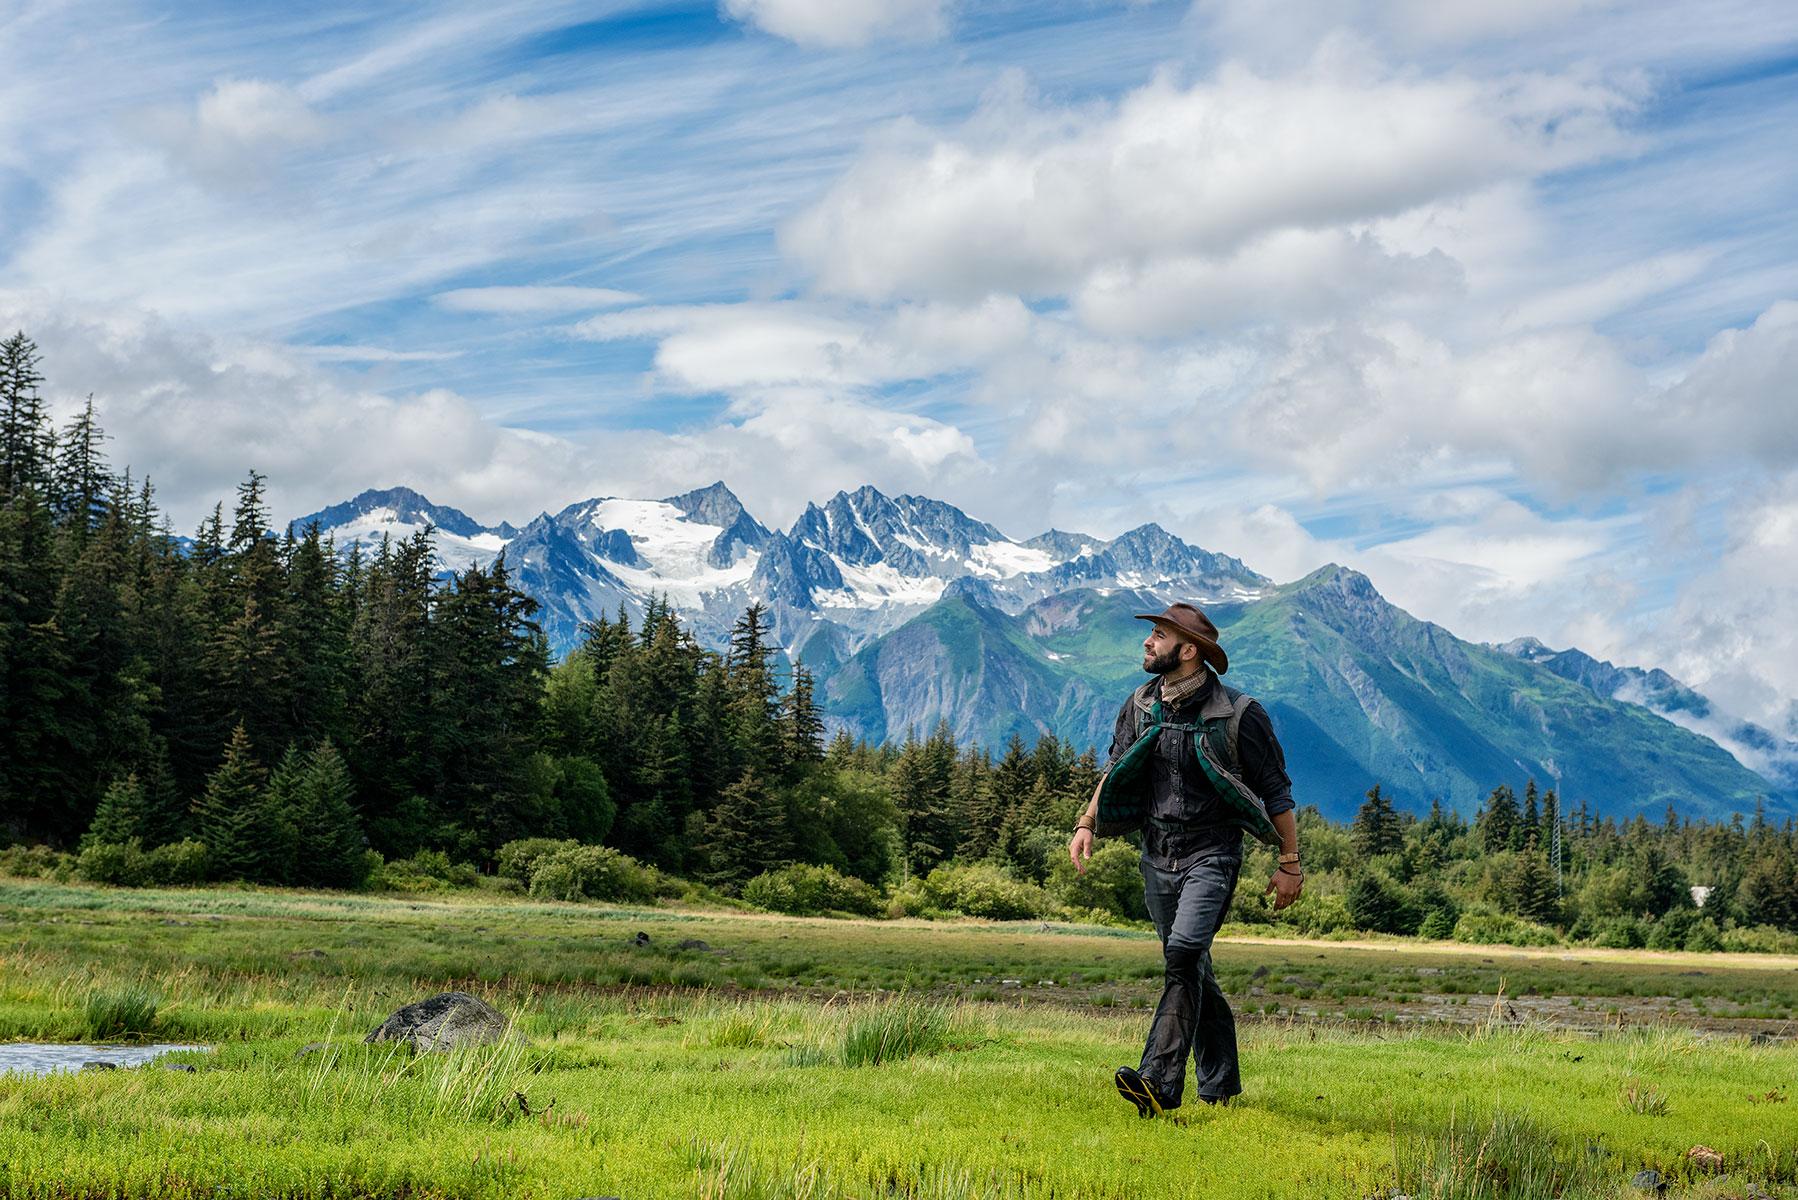 austin-trigg-brave-wilderness-alaska-BW-Coyote-Walks-Mud-Bay-windy-mountains.jpg